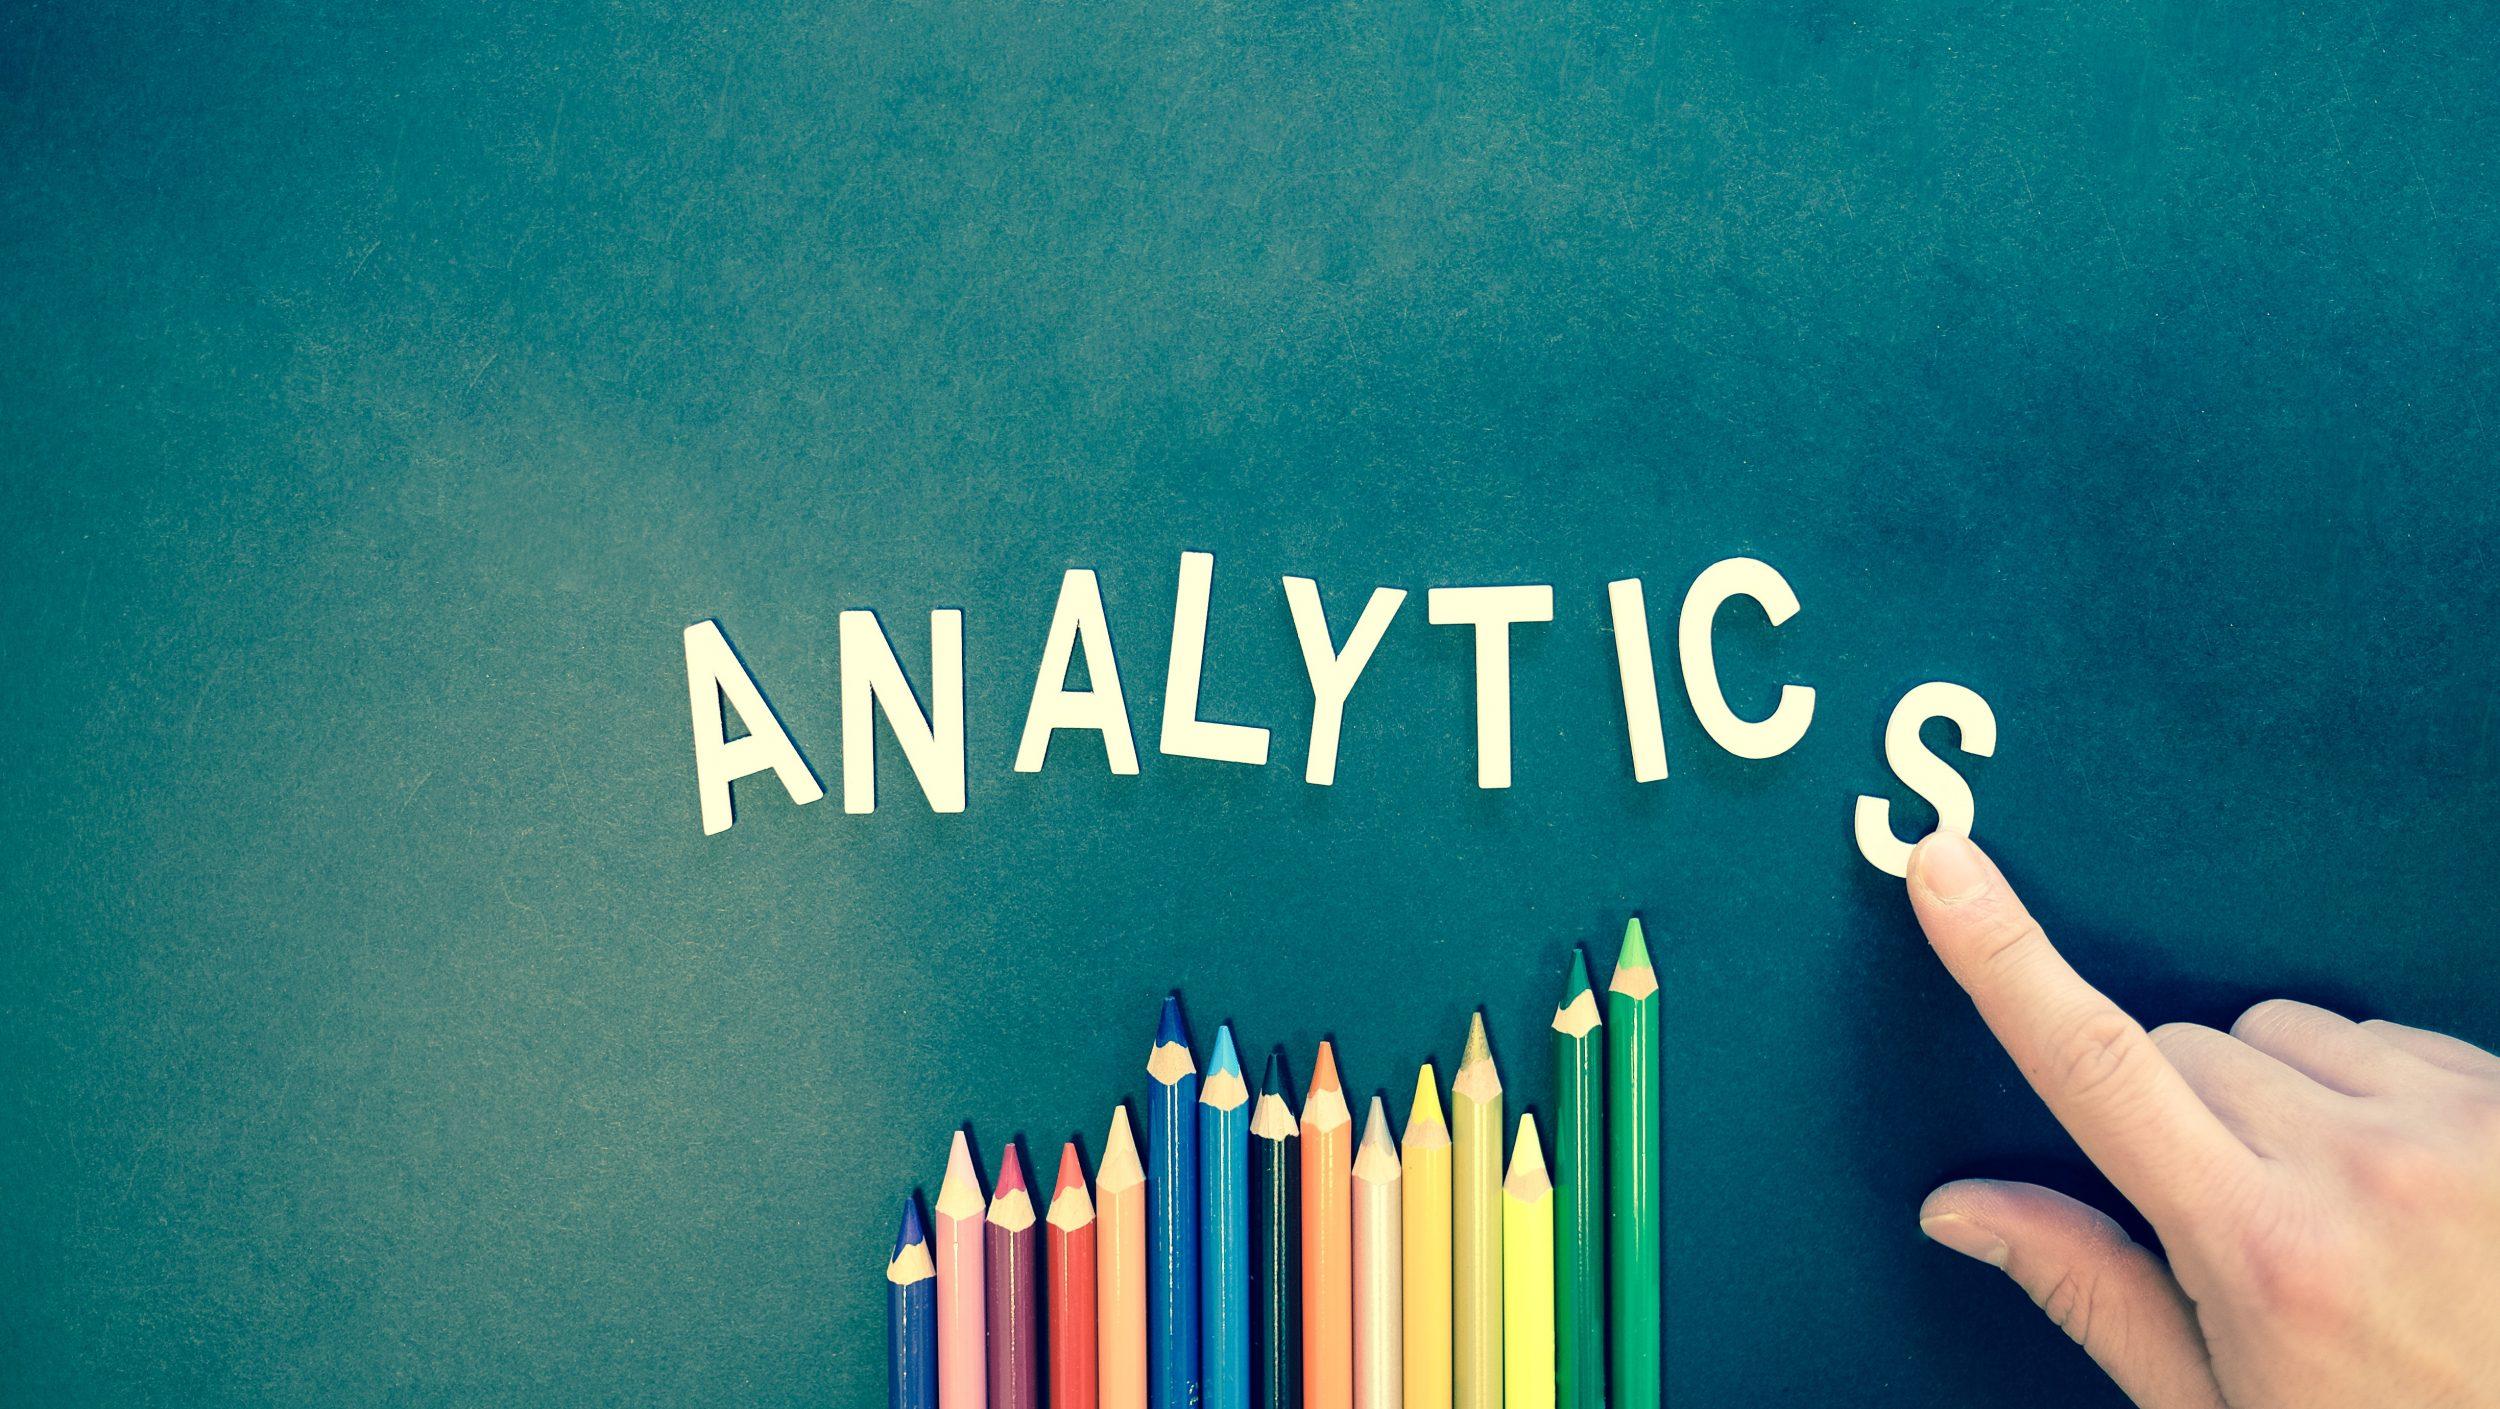 Analytics image for Digital Marketing